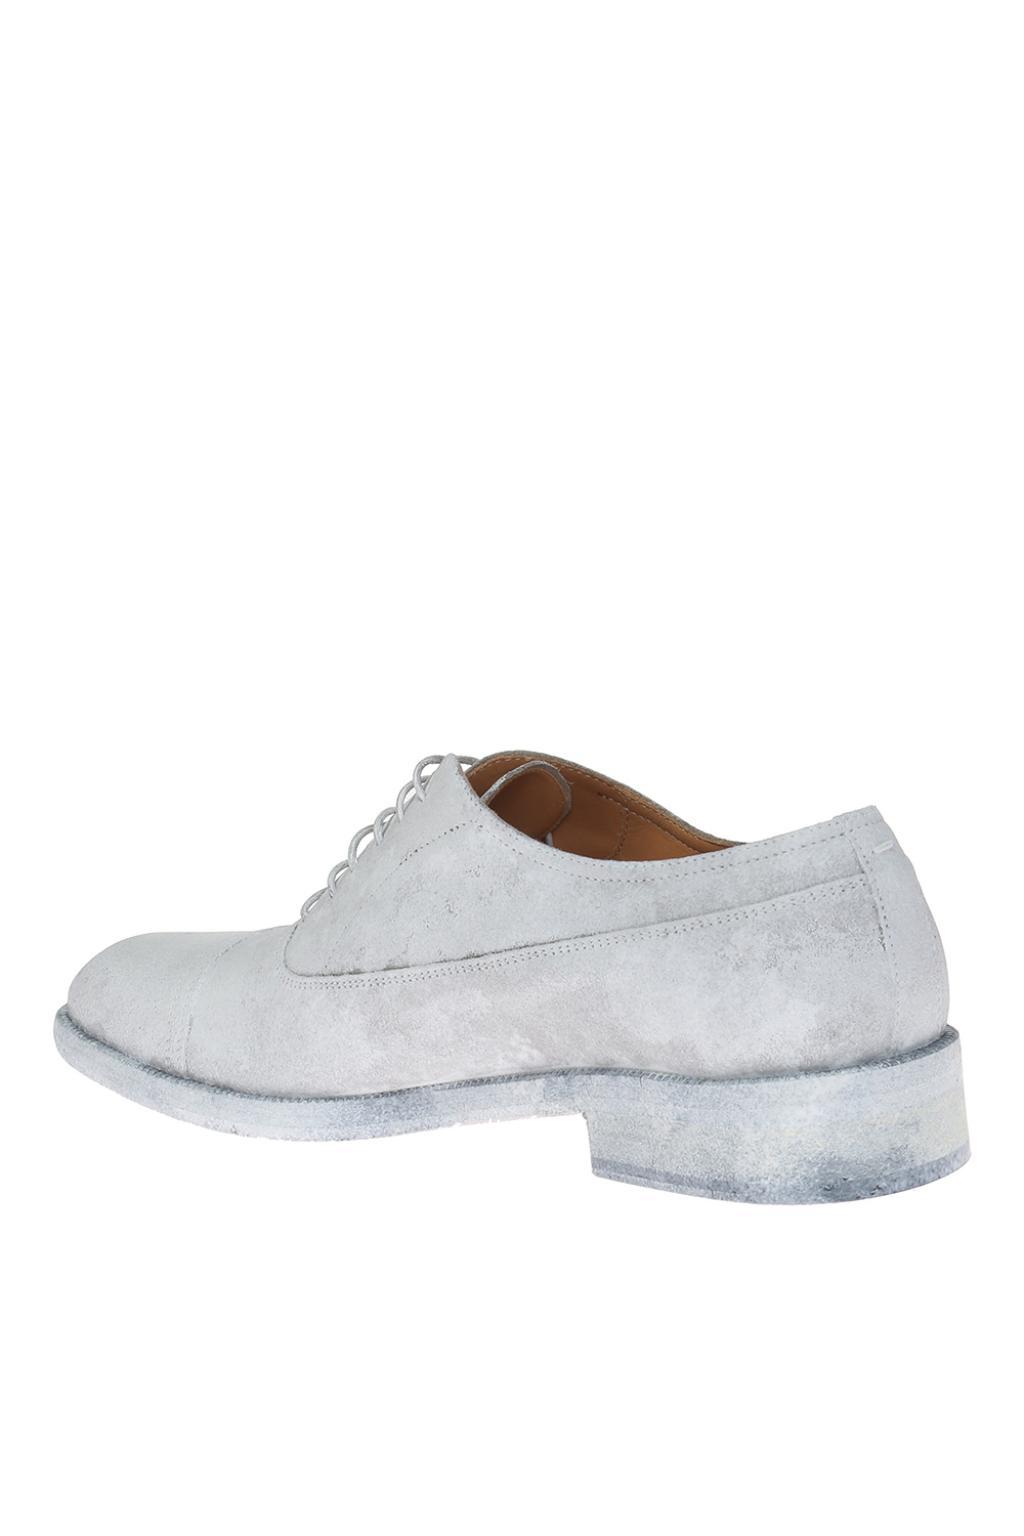 Maison Margiela Paint-splattered shoes